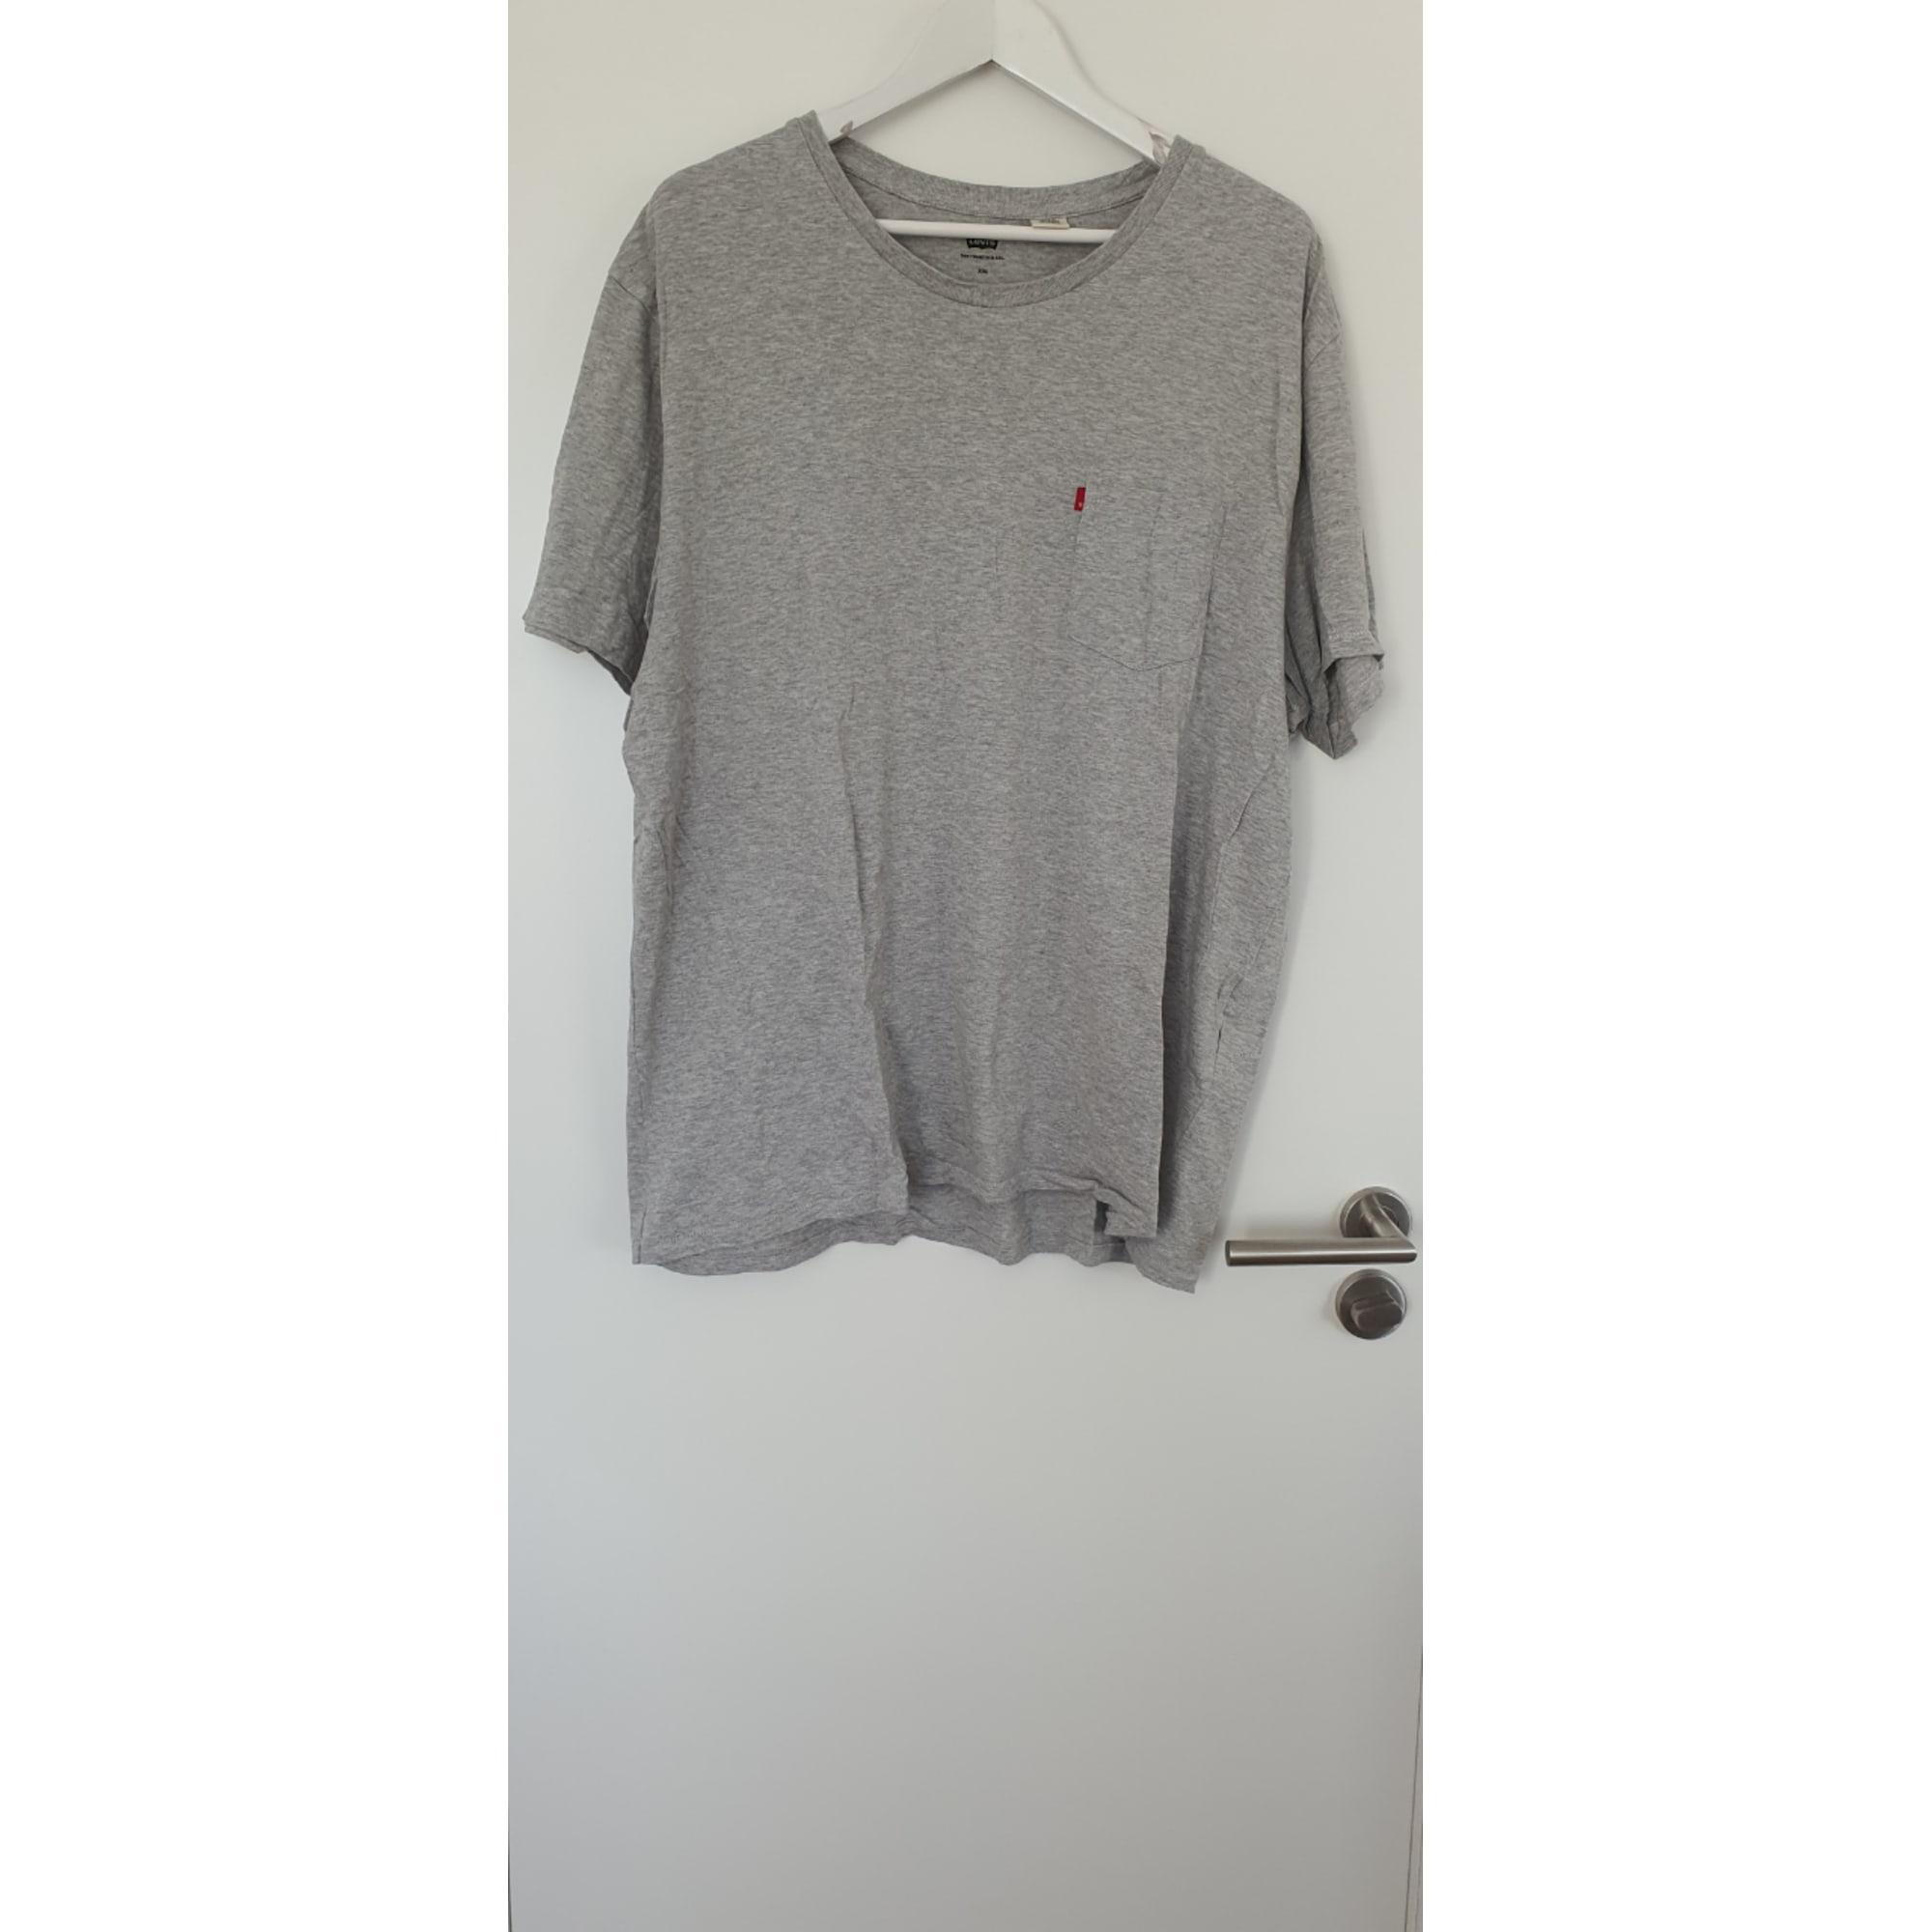 Tee-shirt LEVI'S Gris, anthracite